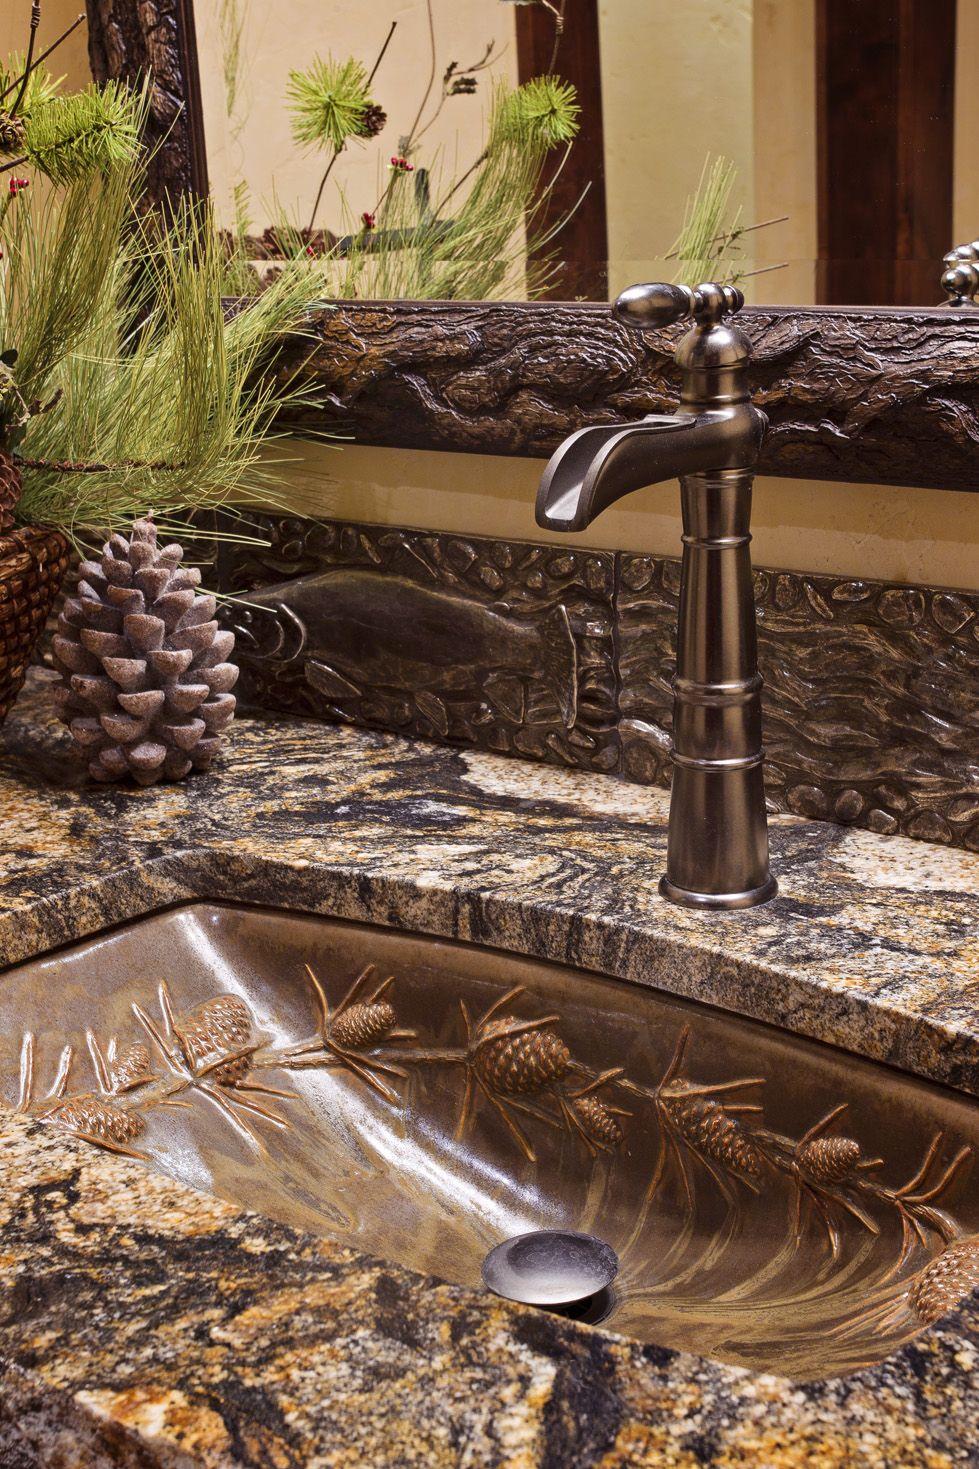 Log cabin bathroom decor - Beautiful And So Ornate Sugar Bowl Custom Residence Frontier Builders Rustic Lodge Decorrustic Cabinsrustic Homeslog